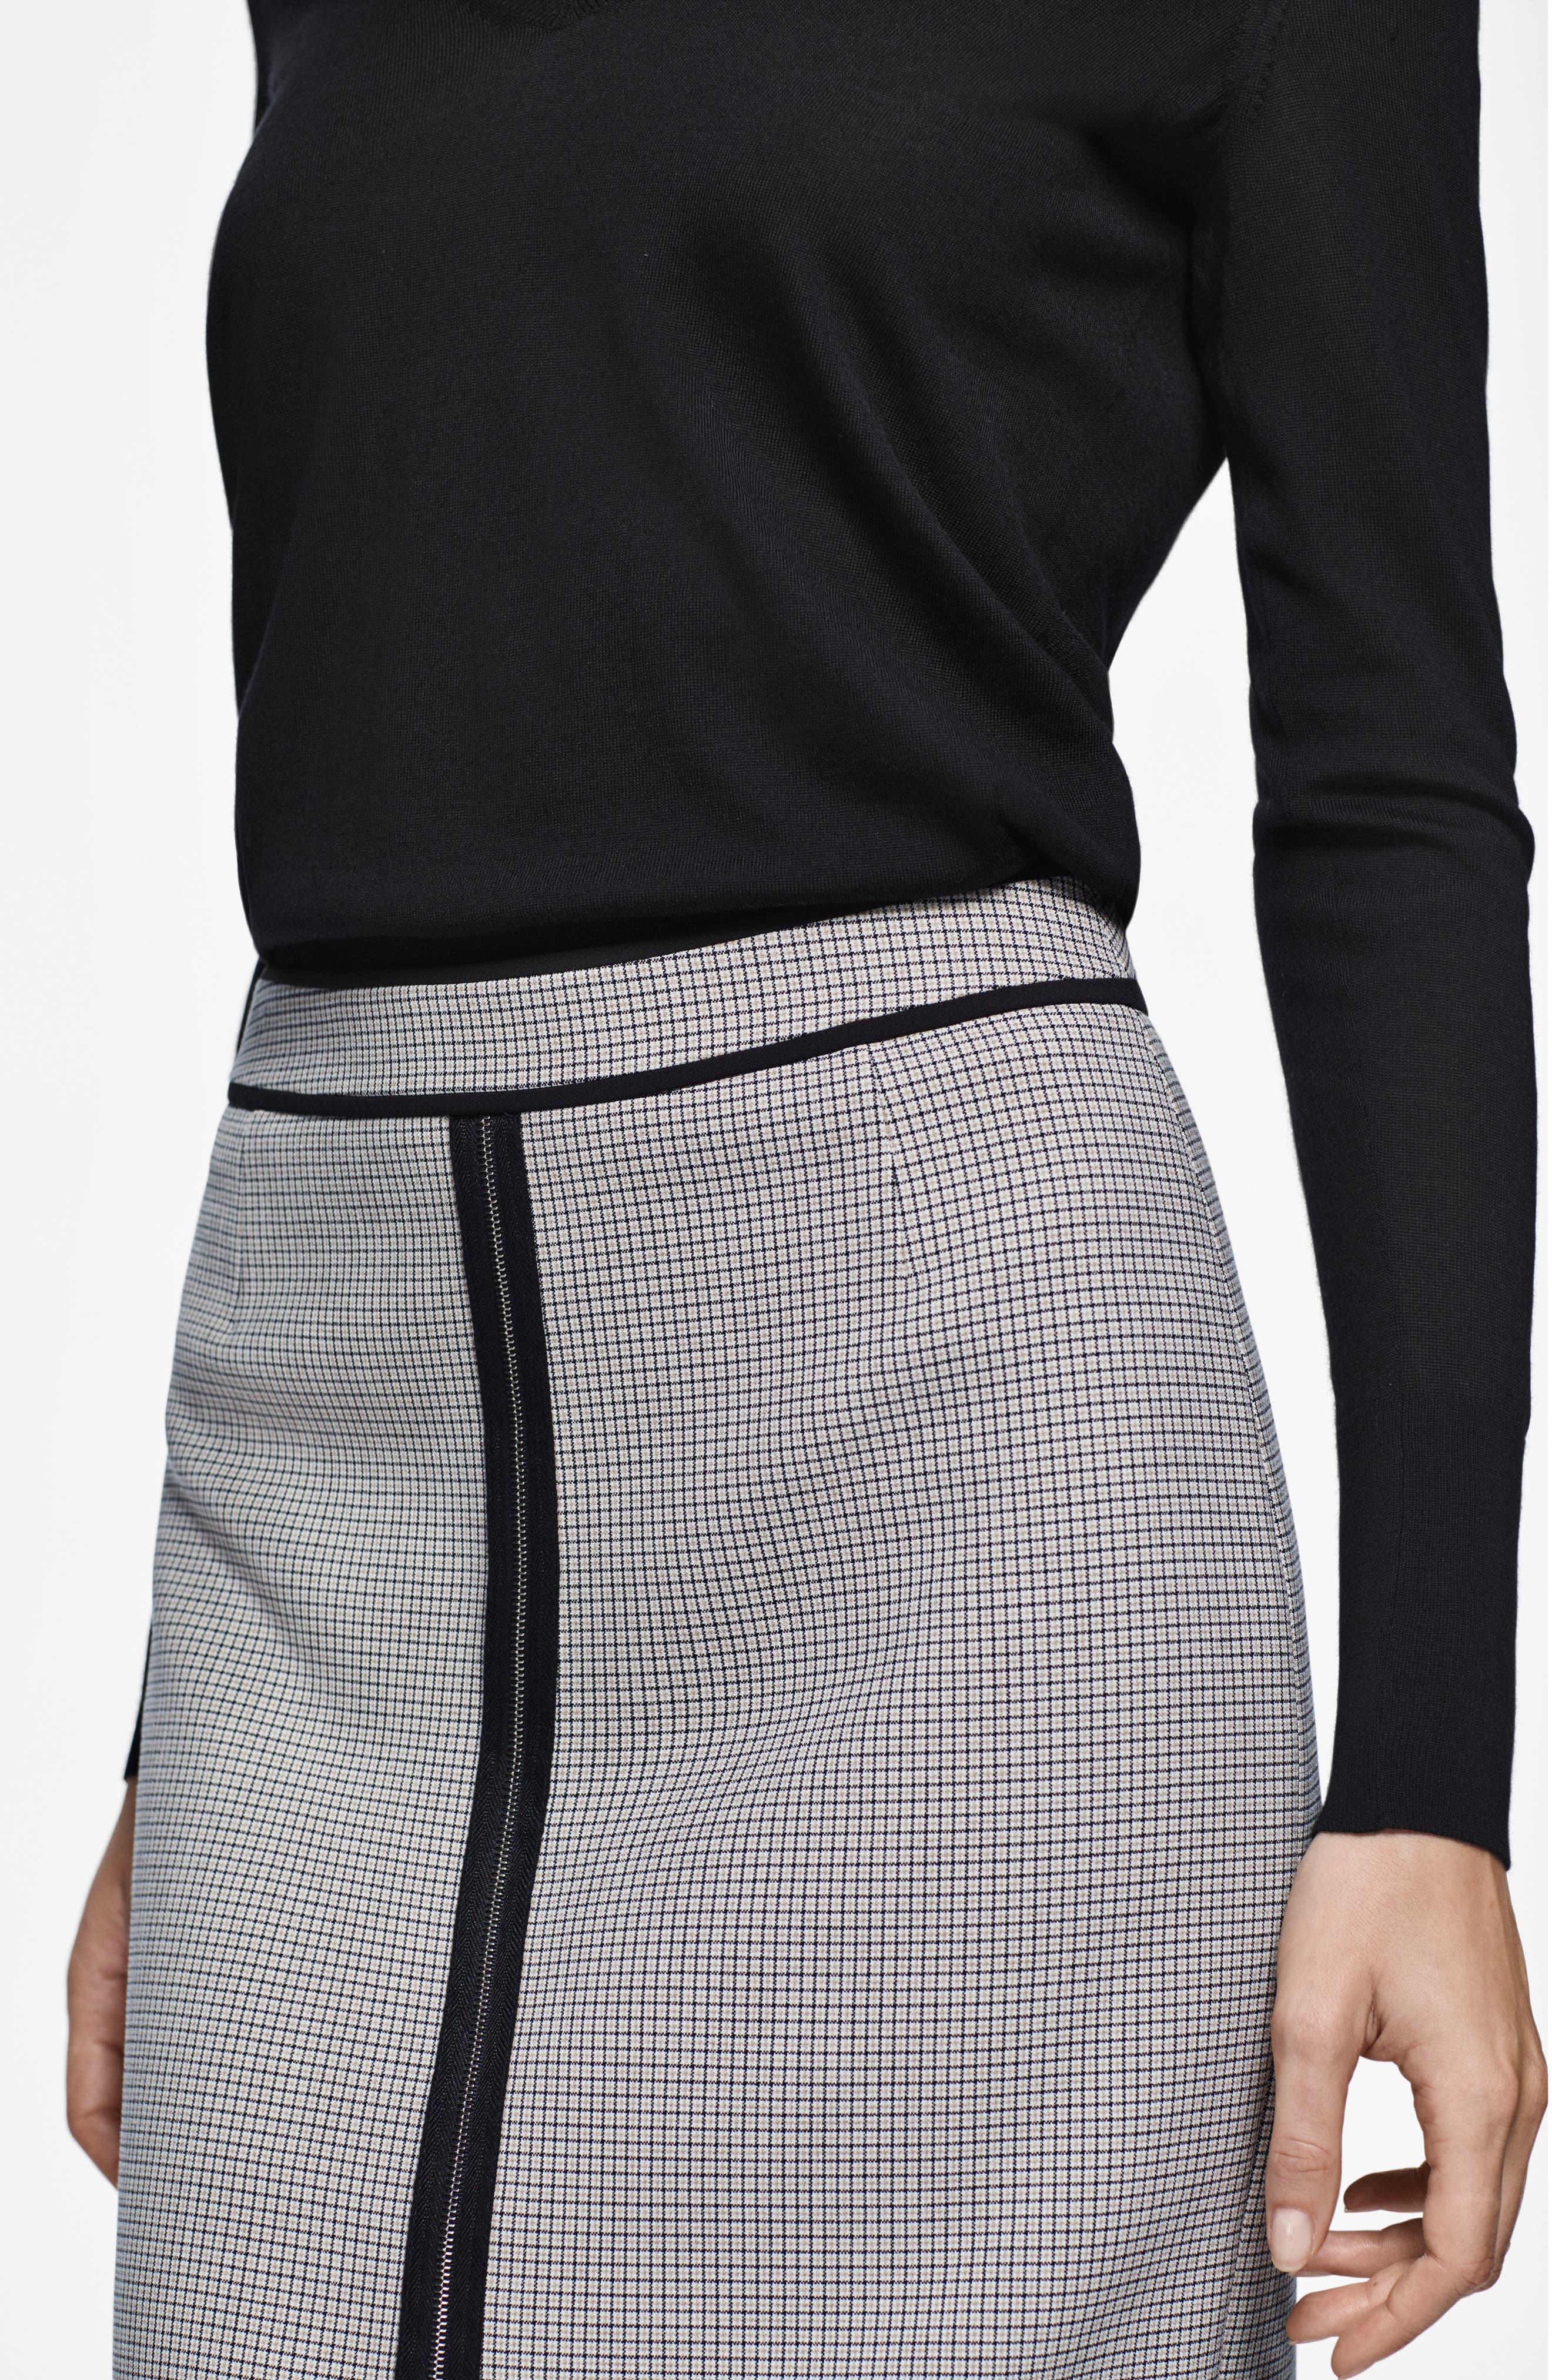 Voliviena Pencil Skirt,                             Alternate thumbnail 8, color,                             STONE FANTASTY